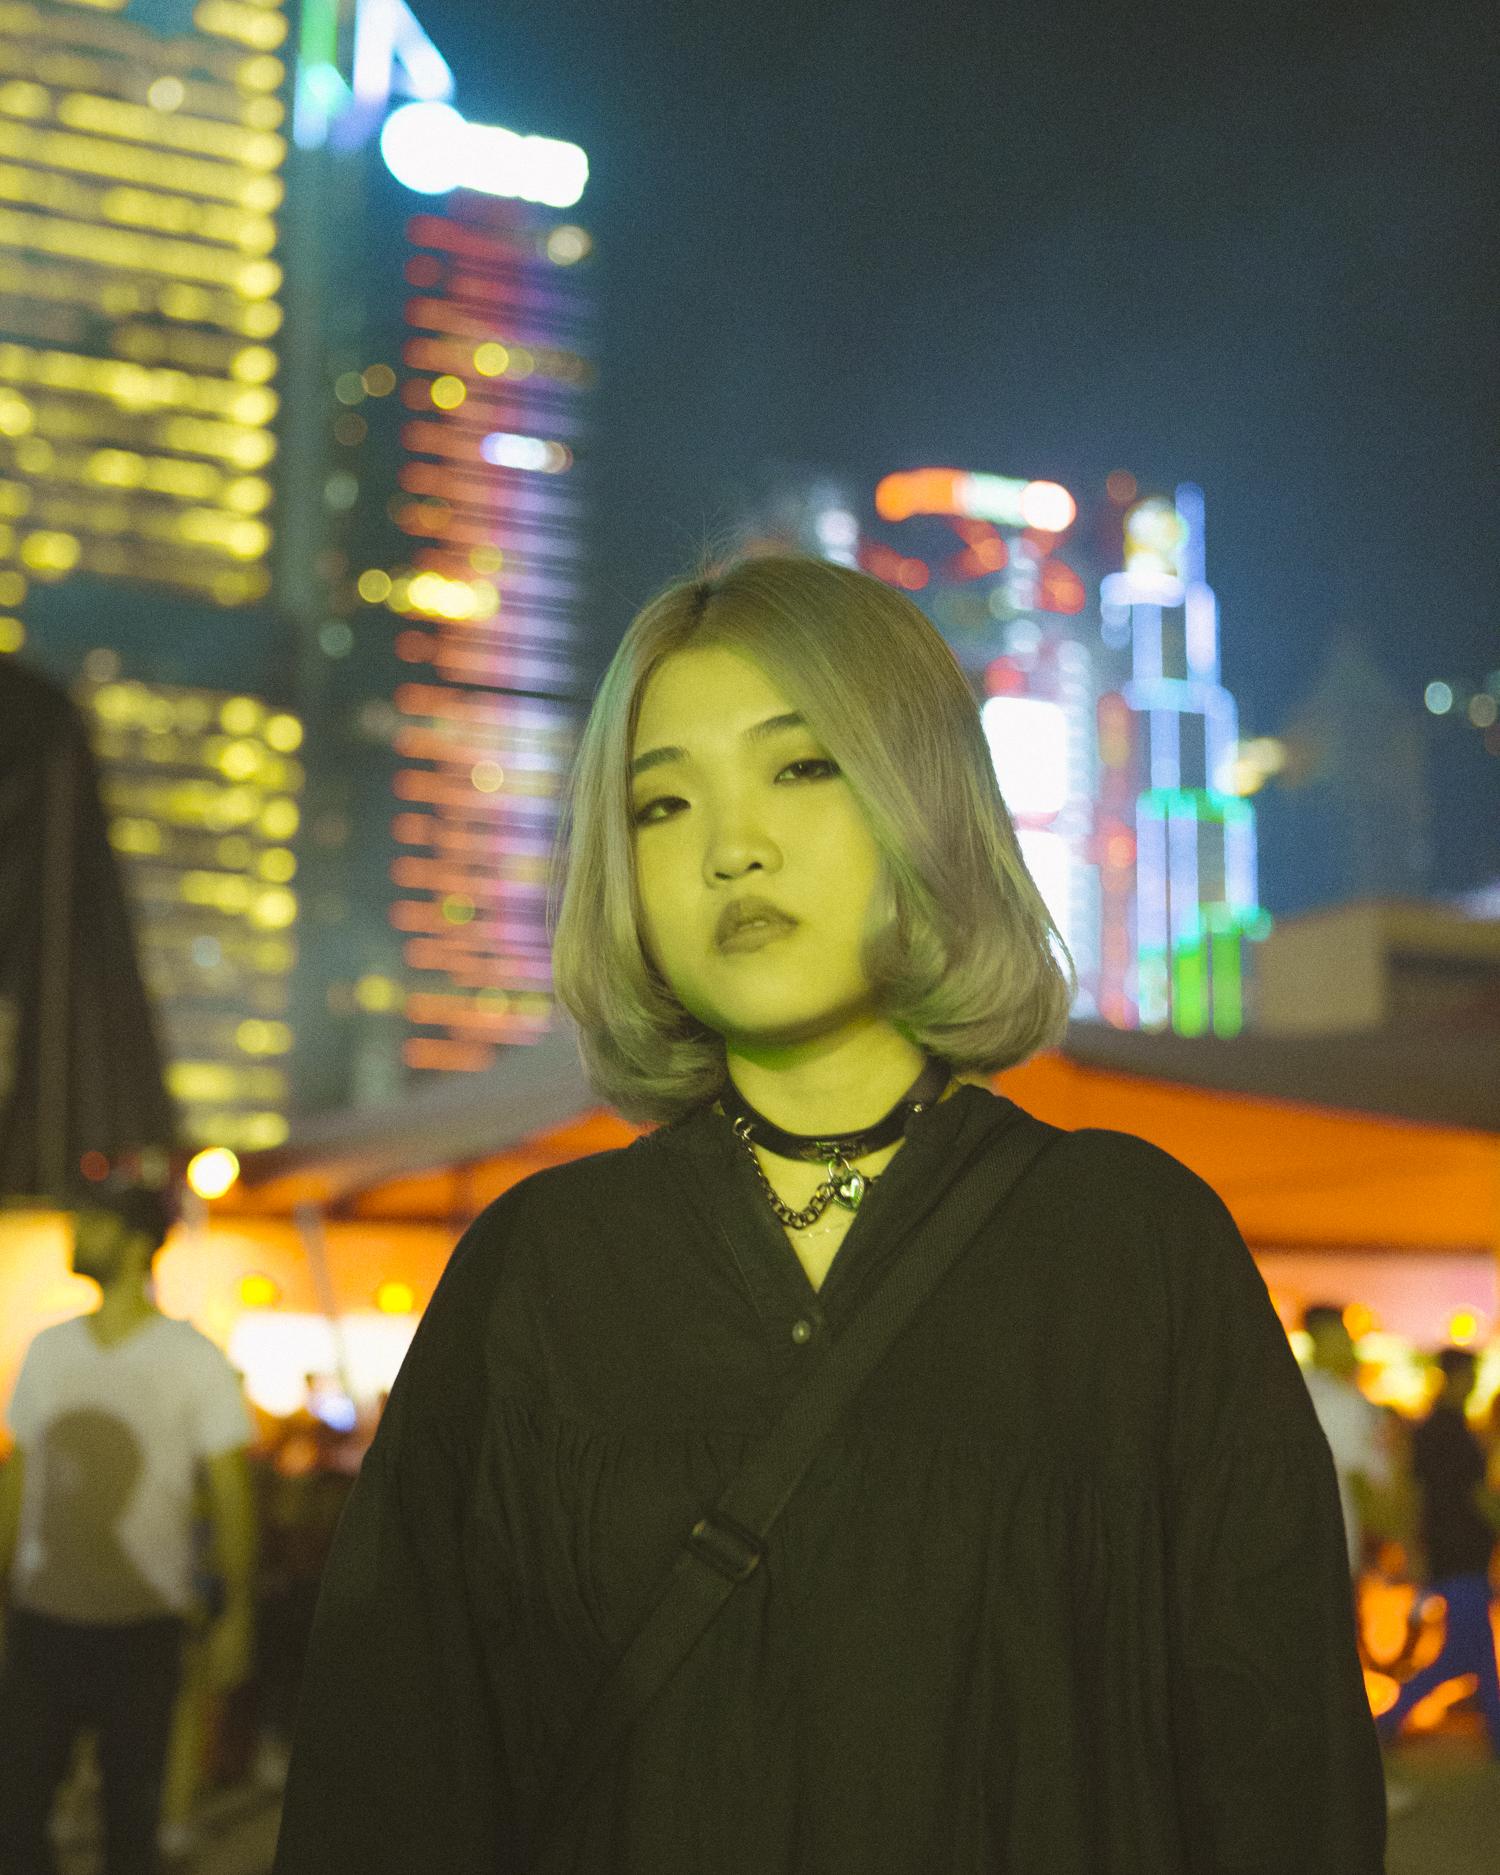 HongKong2018_(c)DesirévandenBerg__87A2099.jpg